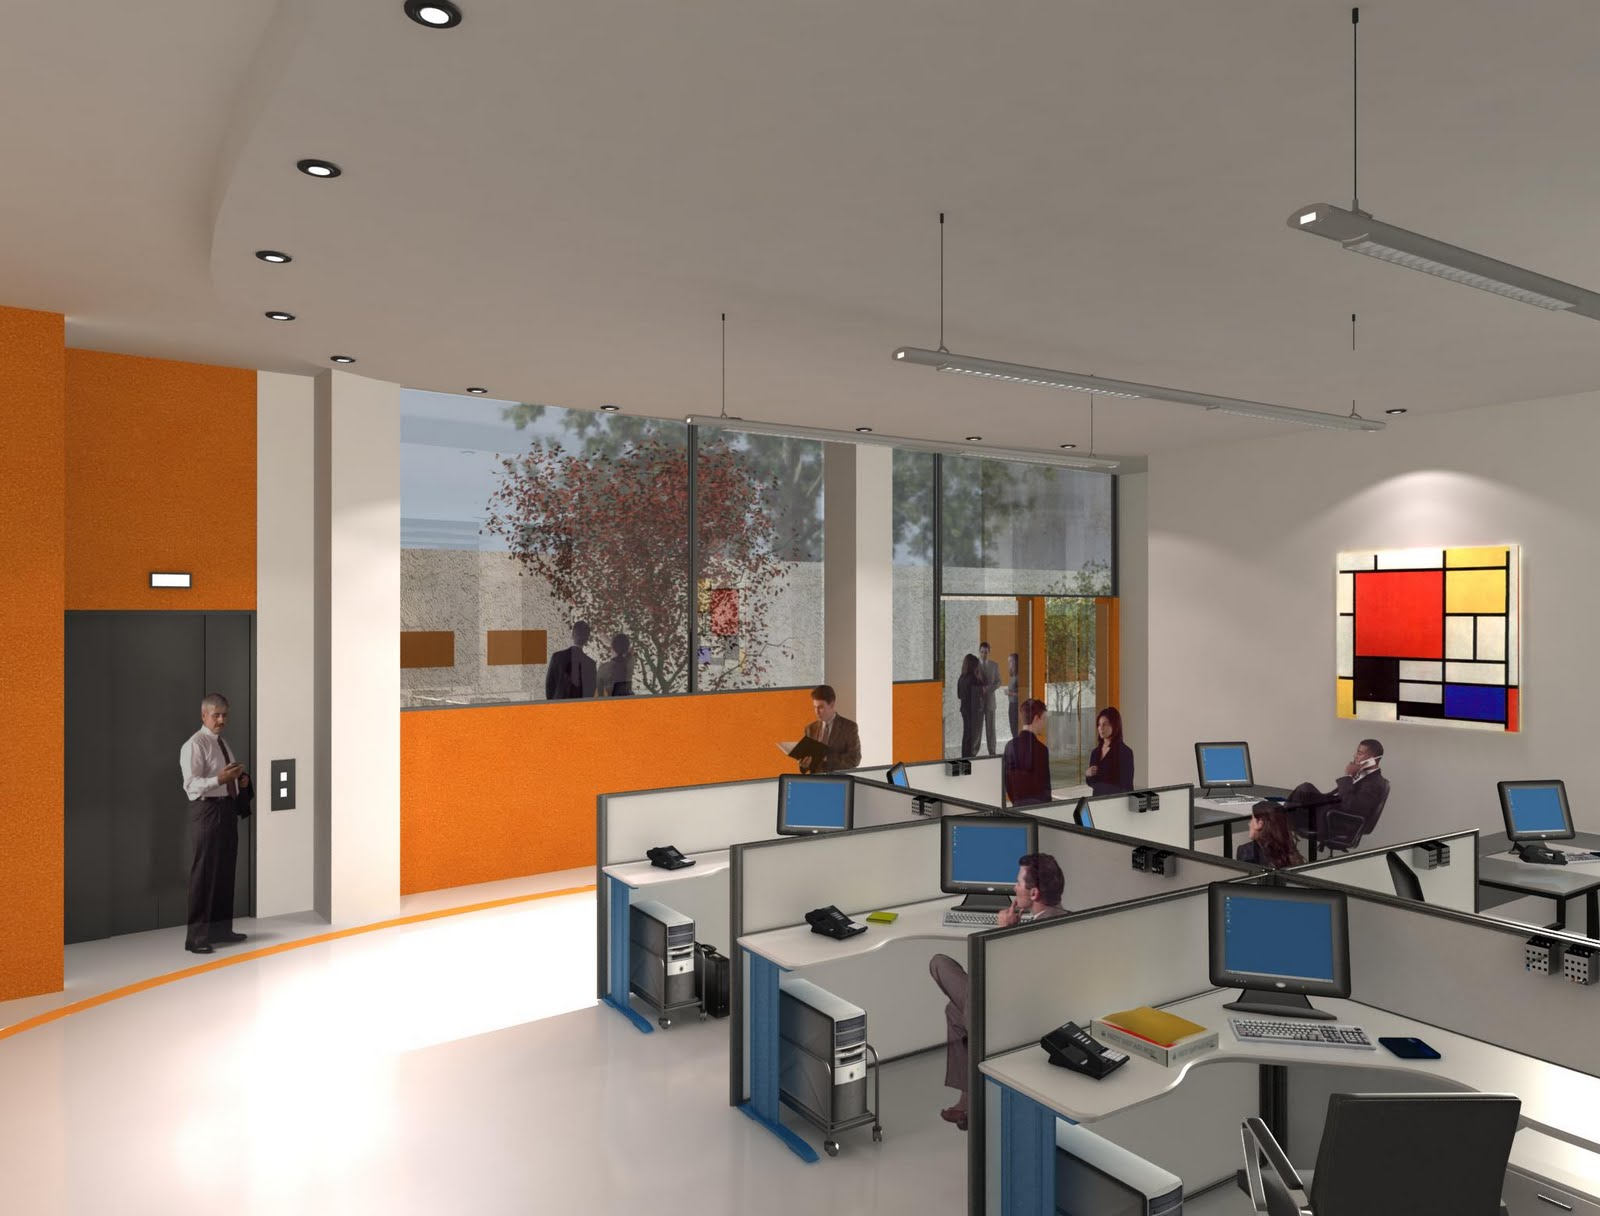 Areko arquitectura 3d edificio oficinas instituto - Oficinas de arquitectura ...